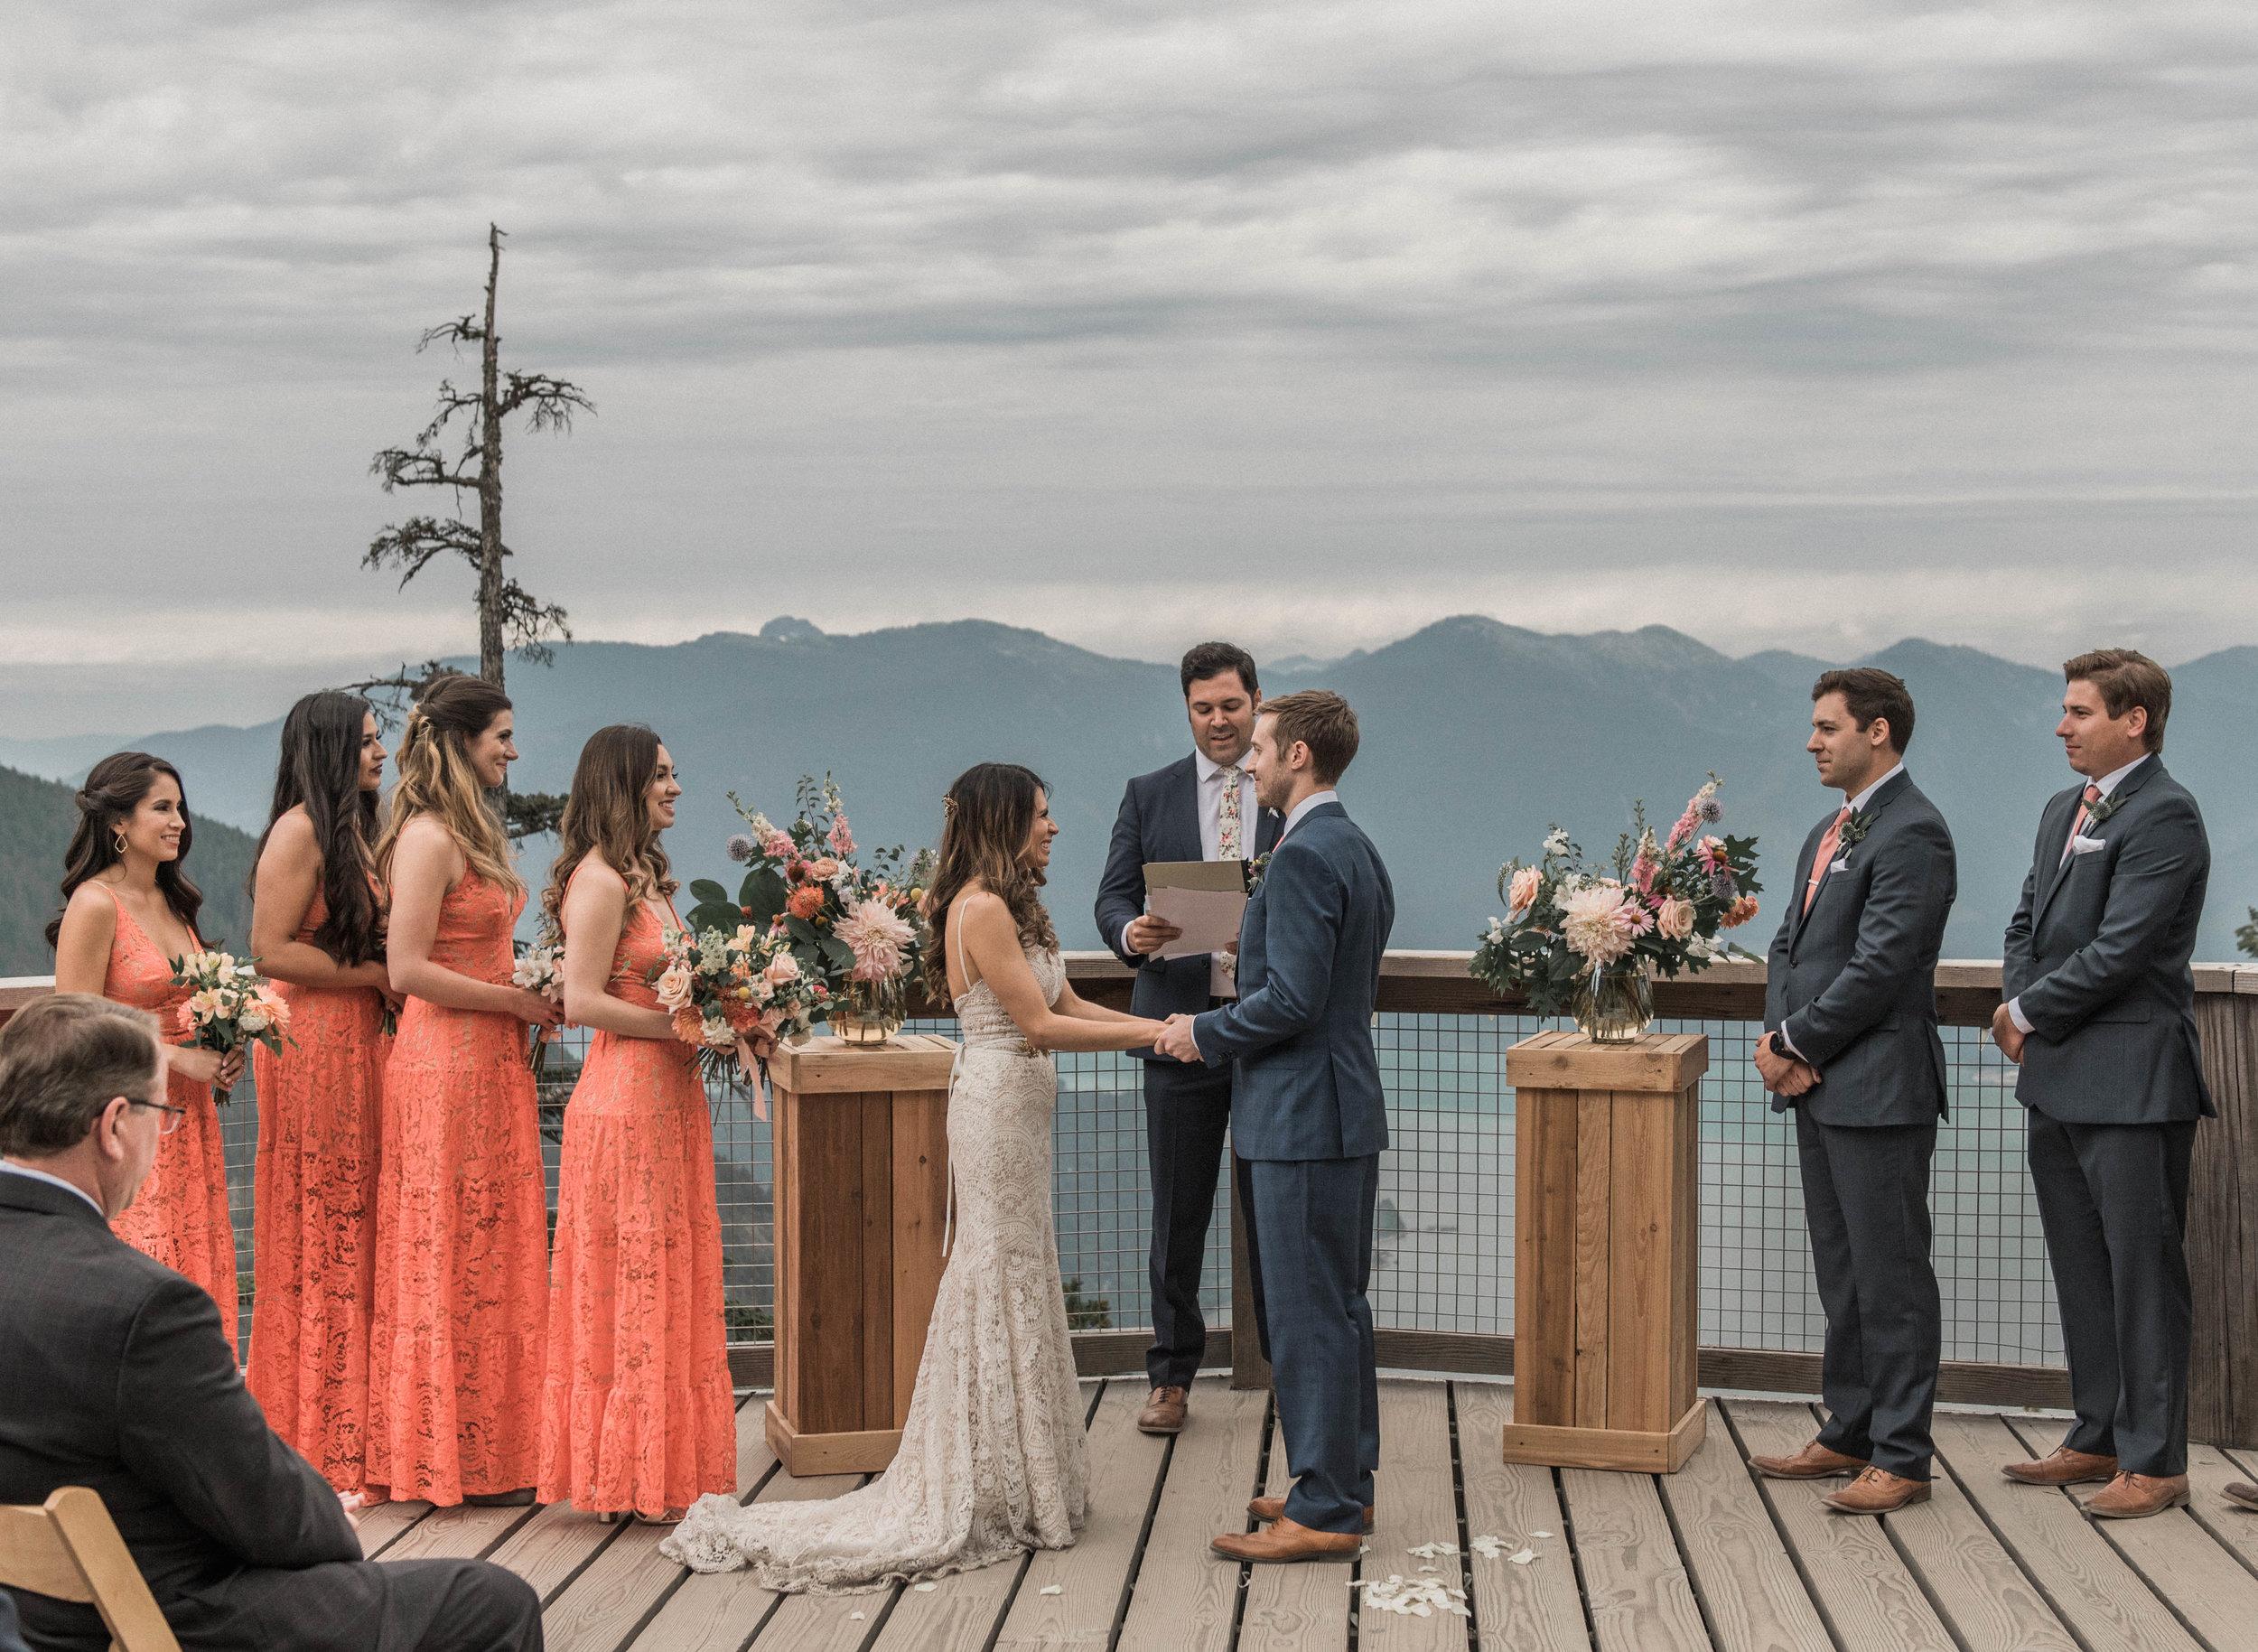 austin-texas-wedding-photography-1778-photographie-87.jpg